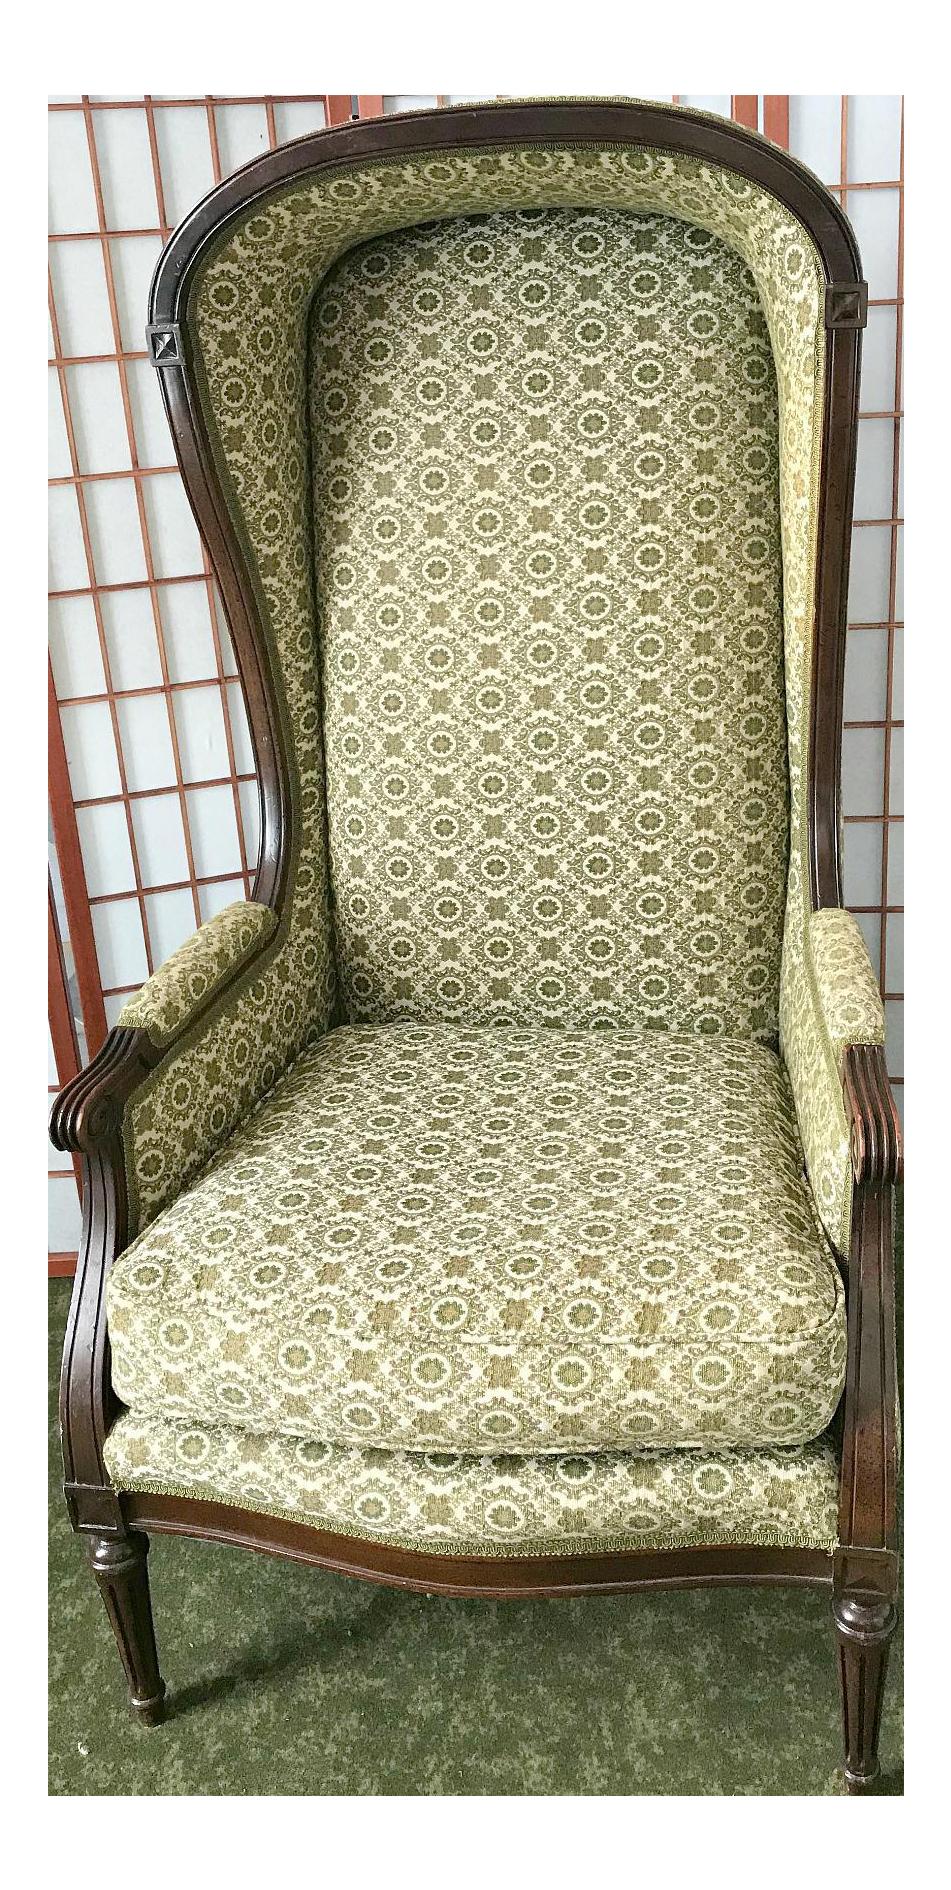 vintage-victorian-hooded-bonnet-chair-0770?aspectu003dfitu0026widthu003d320u0026heightu003d320